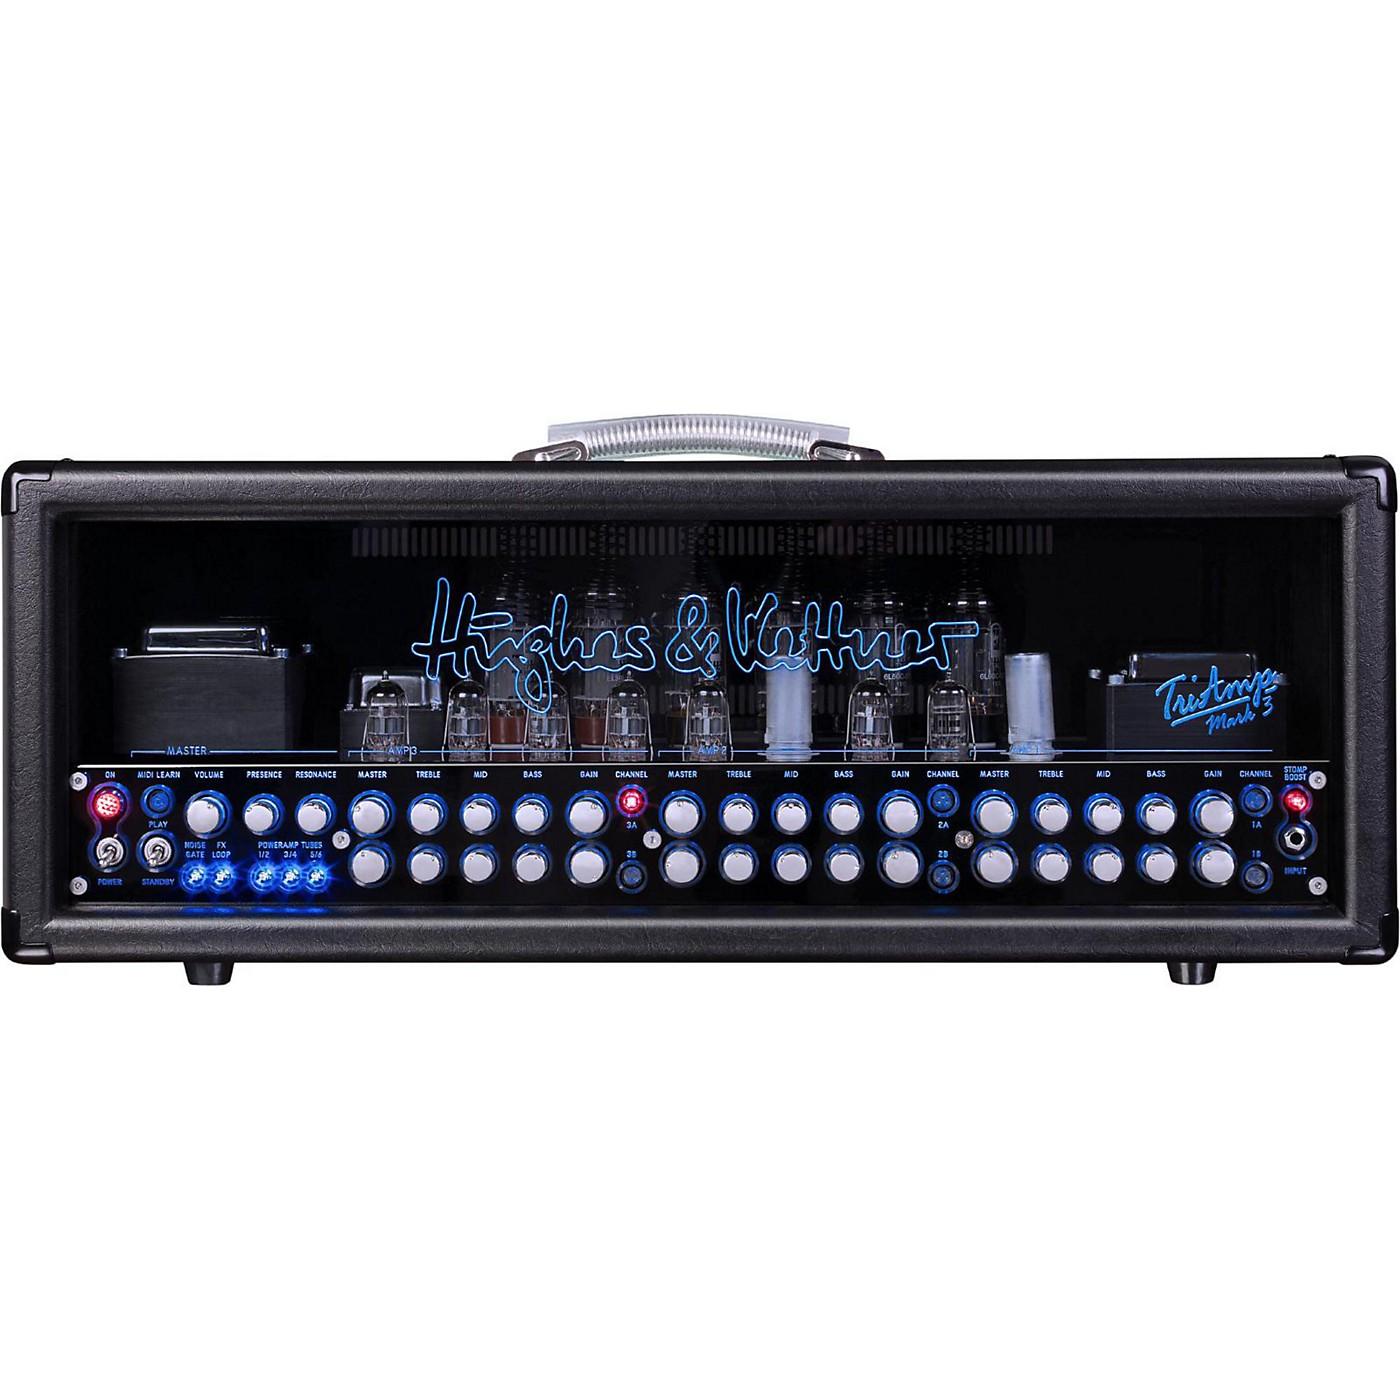 Hughes & Kettner Triamp Mark 3 150W Tube Guitar Amp Head thumbnail